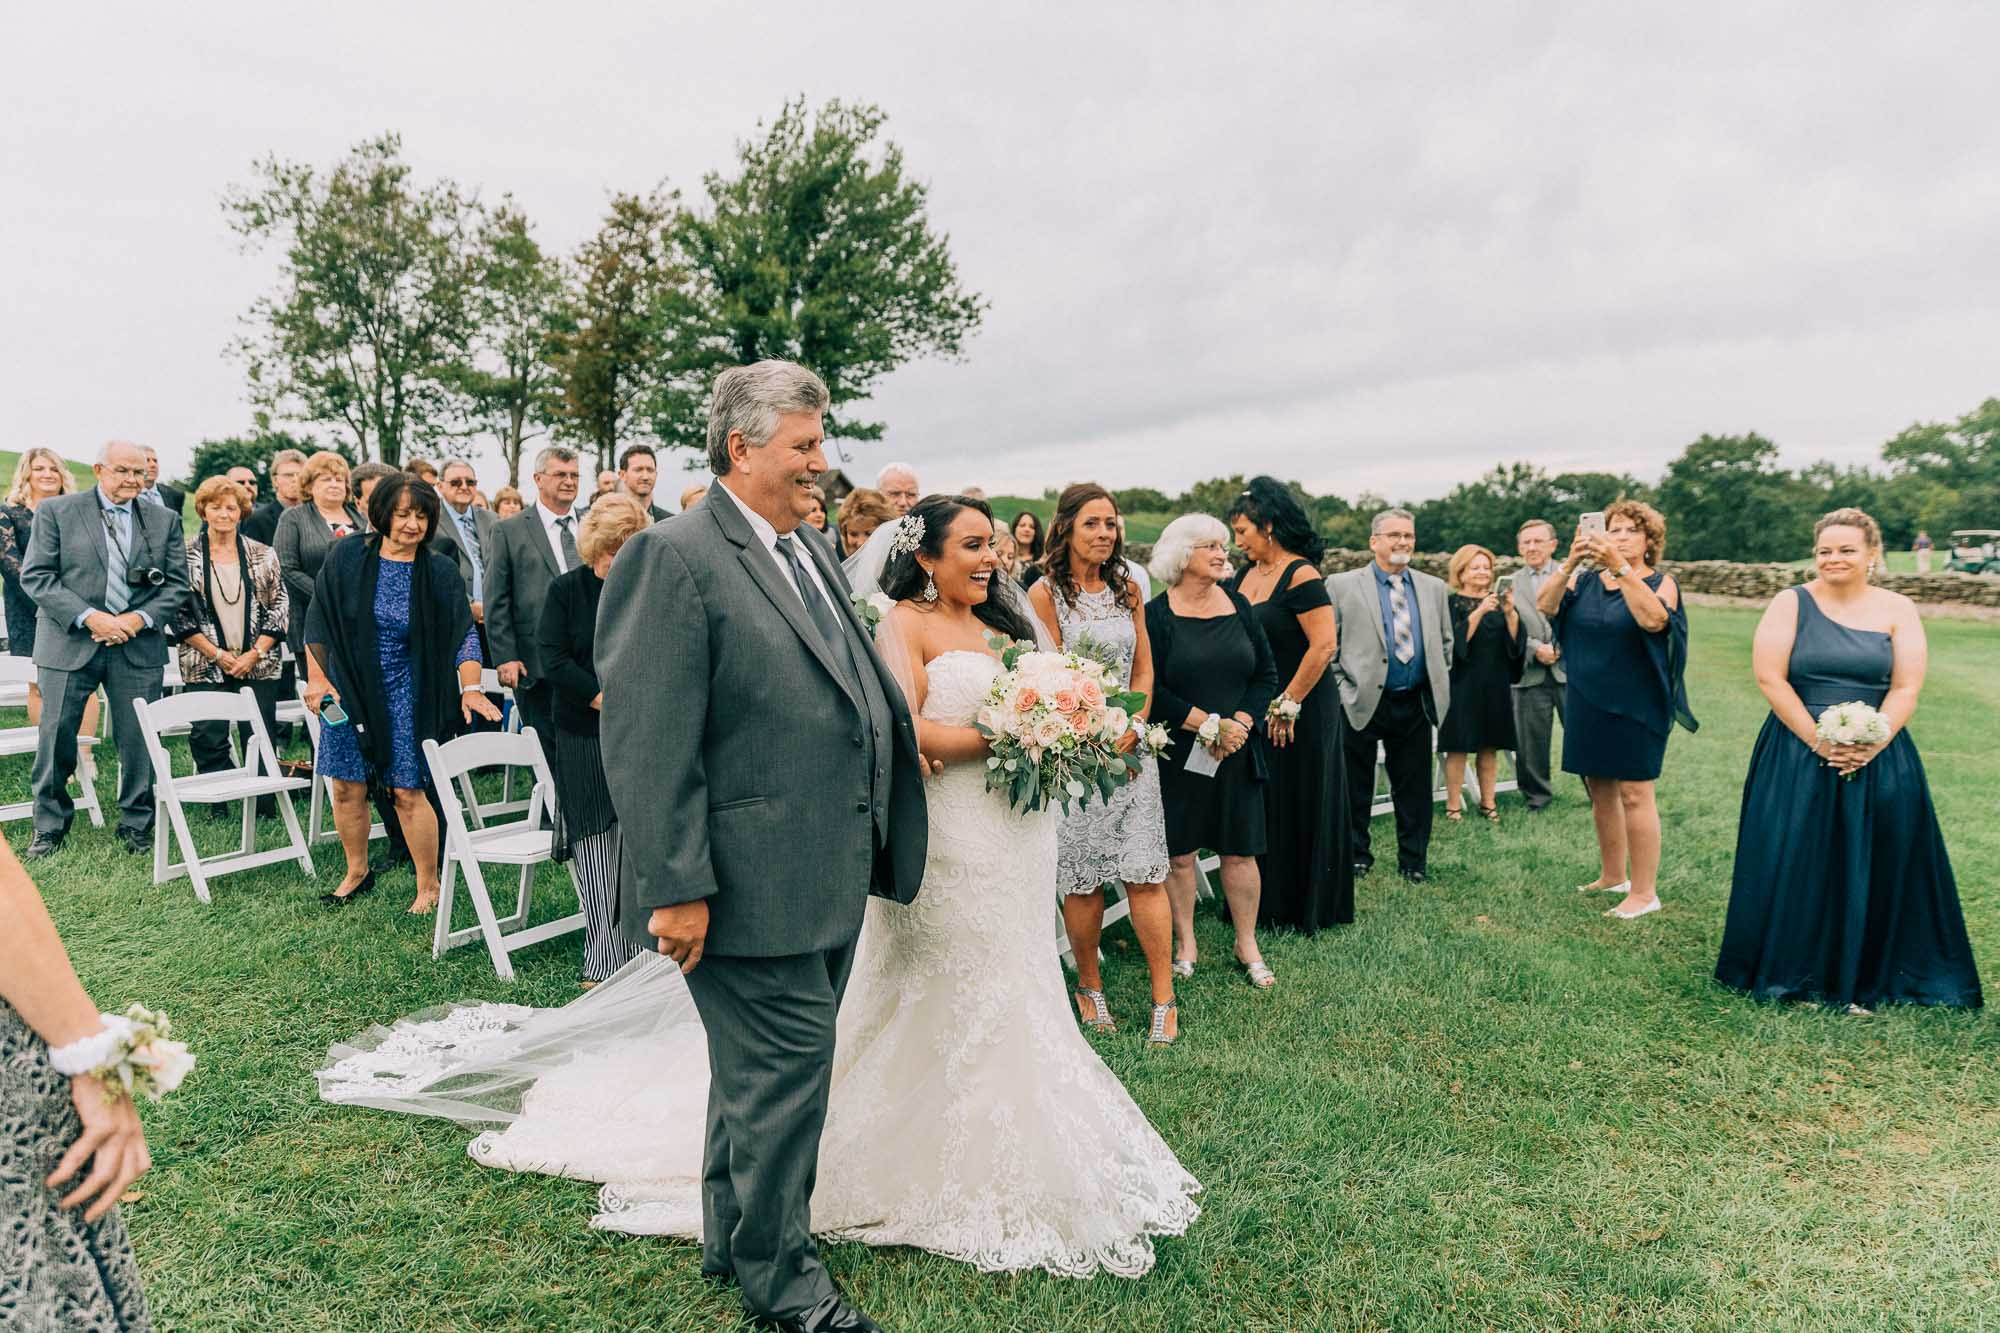 stonhedge-country-club-wedding-3046.jpg